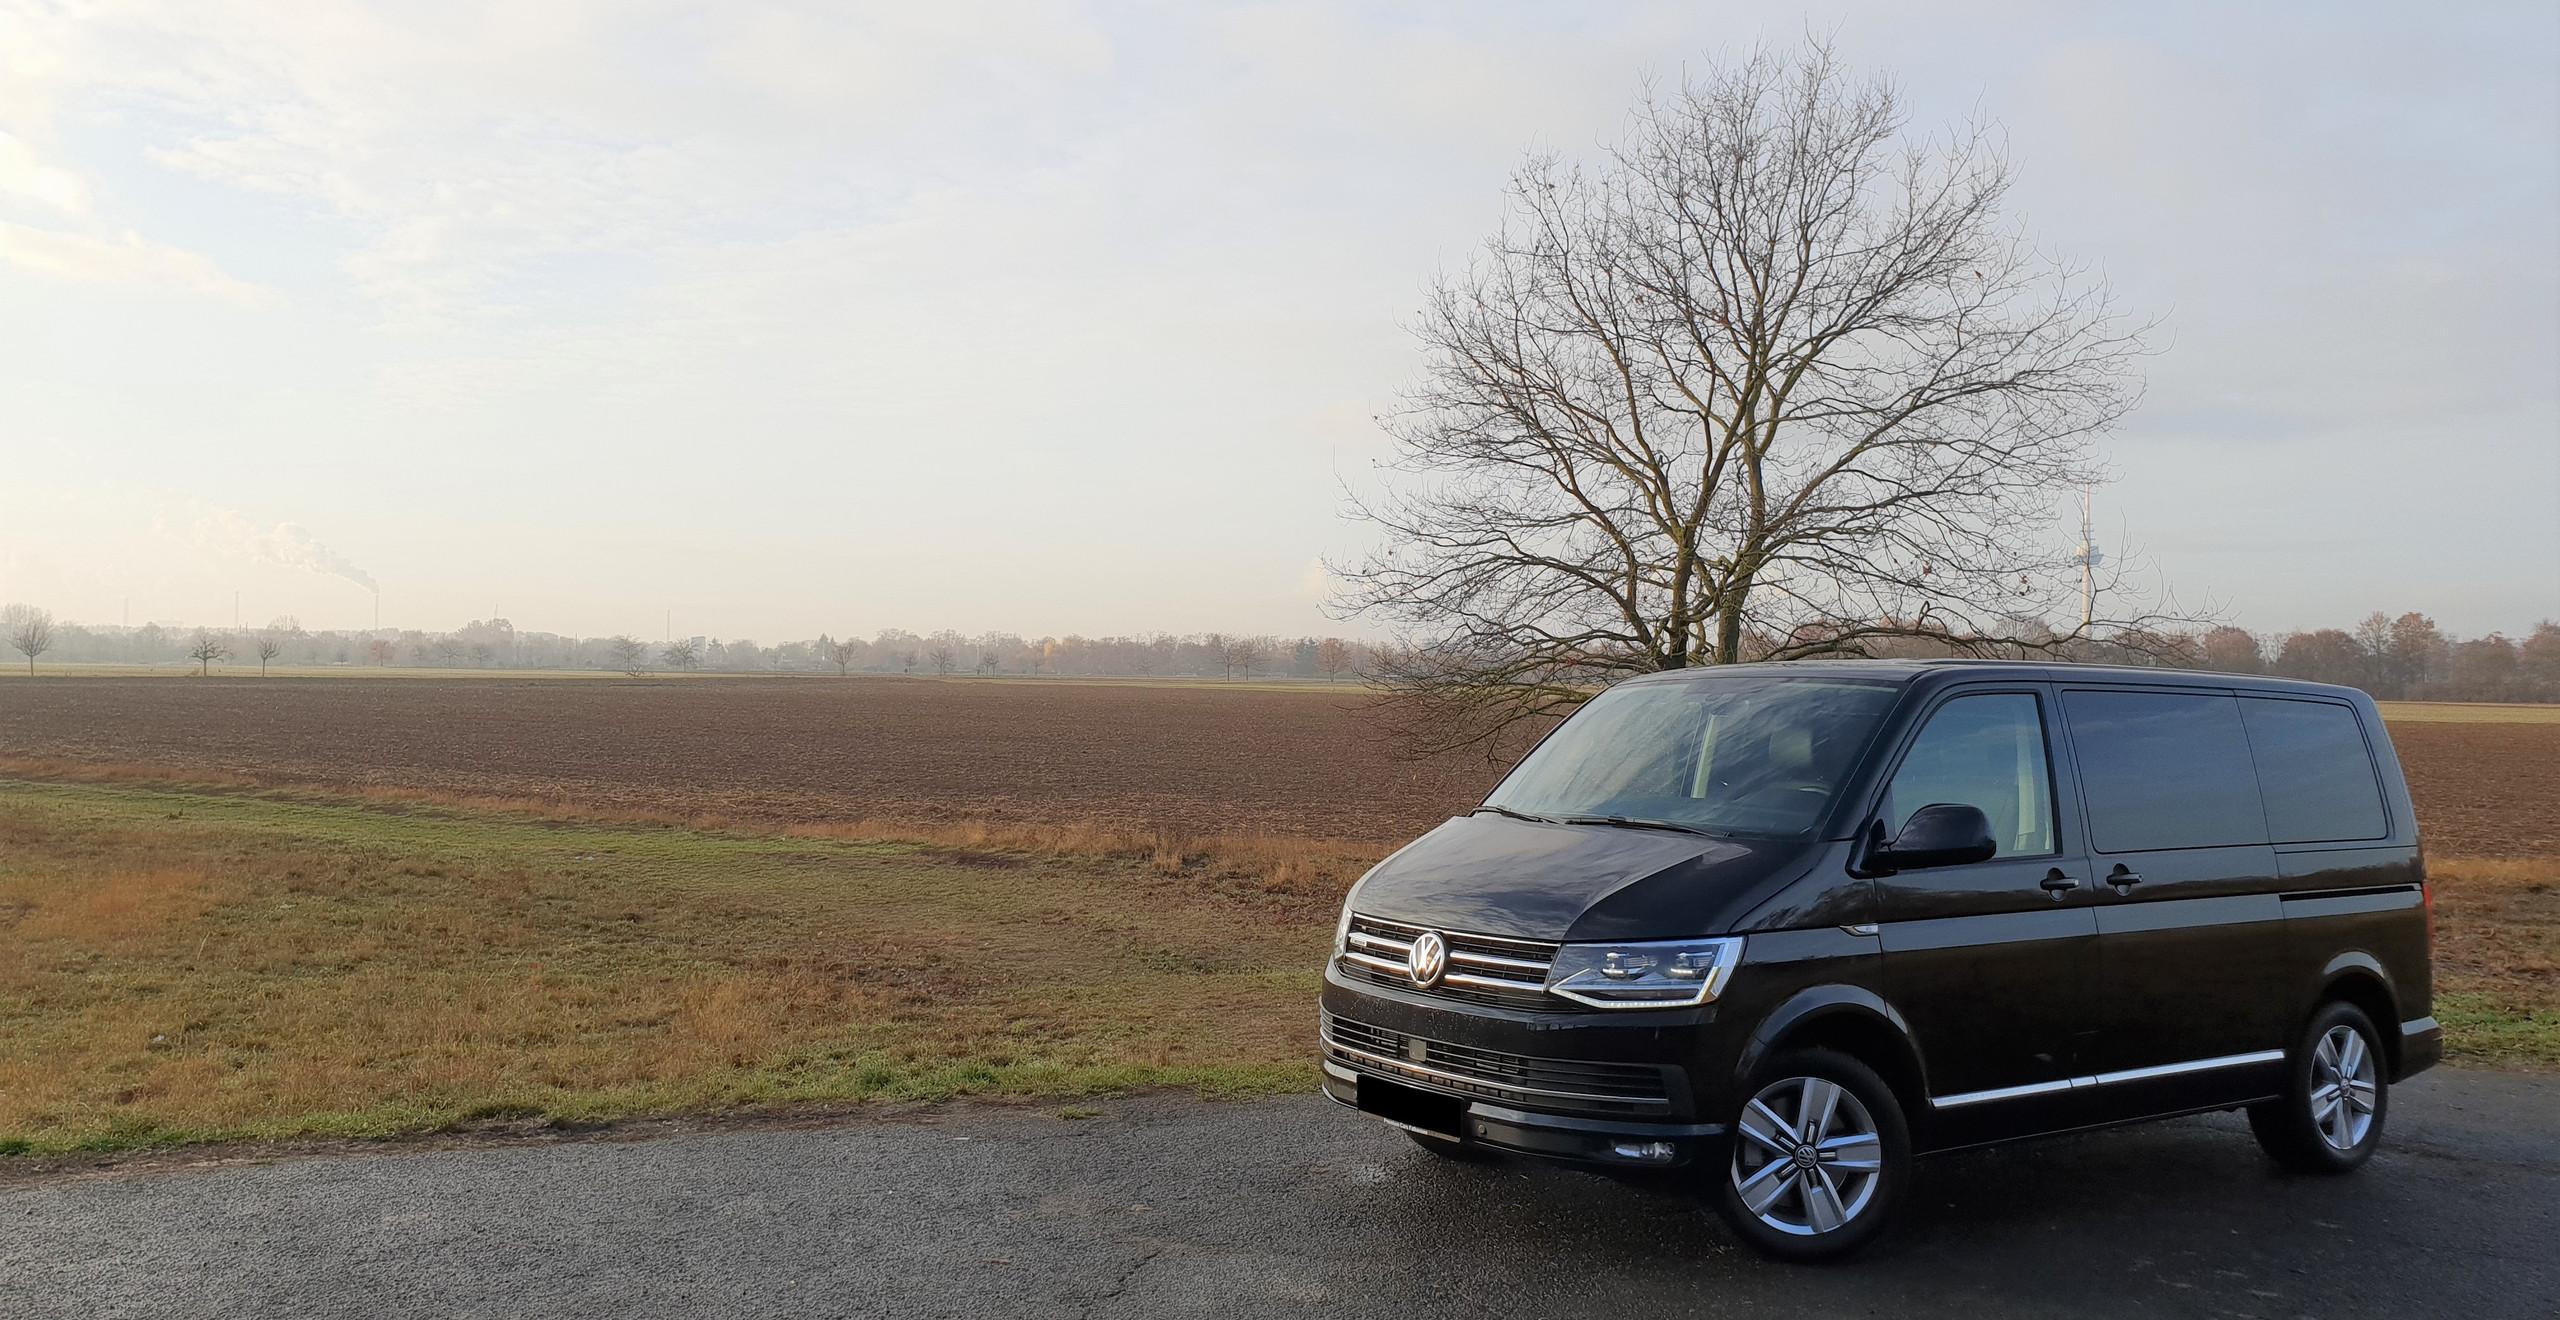 Import Auto Allemagne - Auto Convoi Allemagne - Volkswagen T6 Multivan Highline 4motion 2.0 TDI 204ch